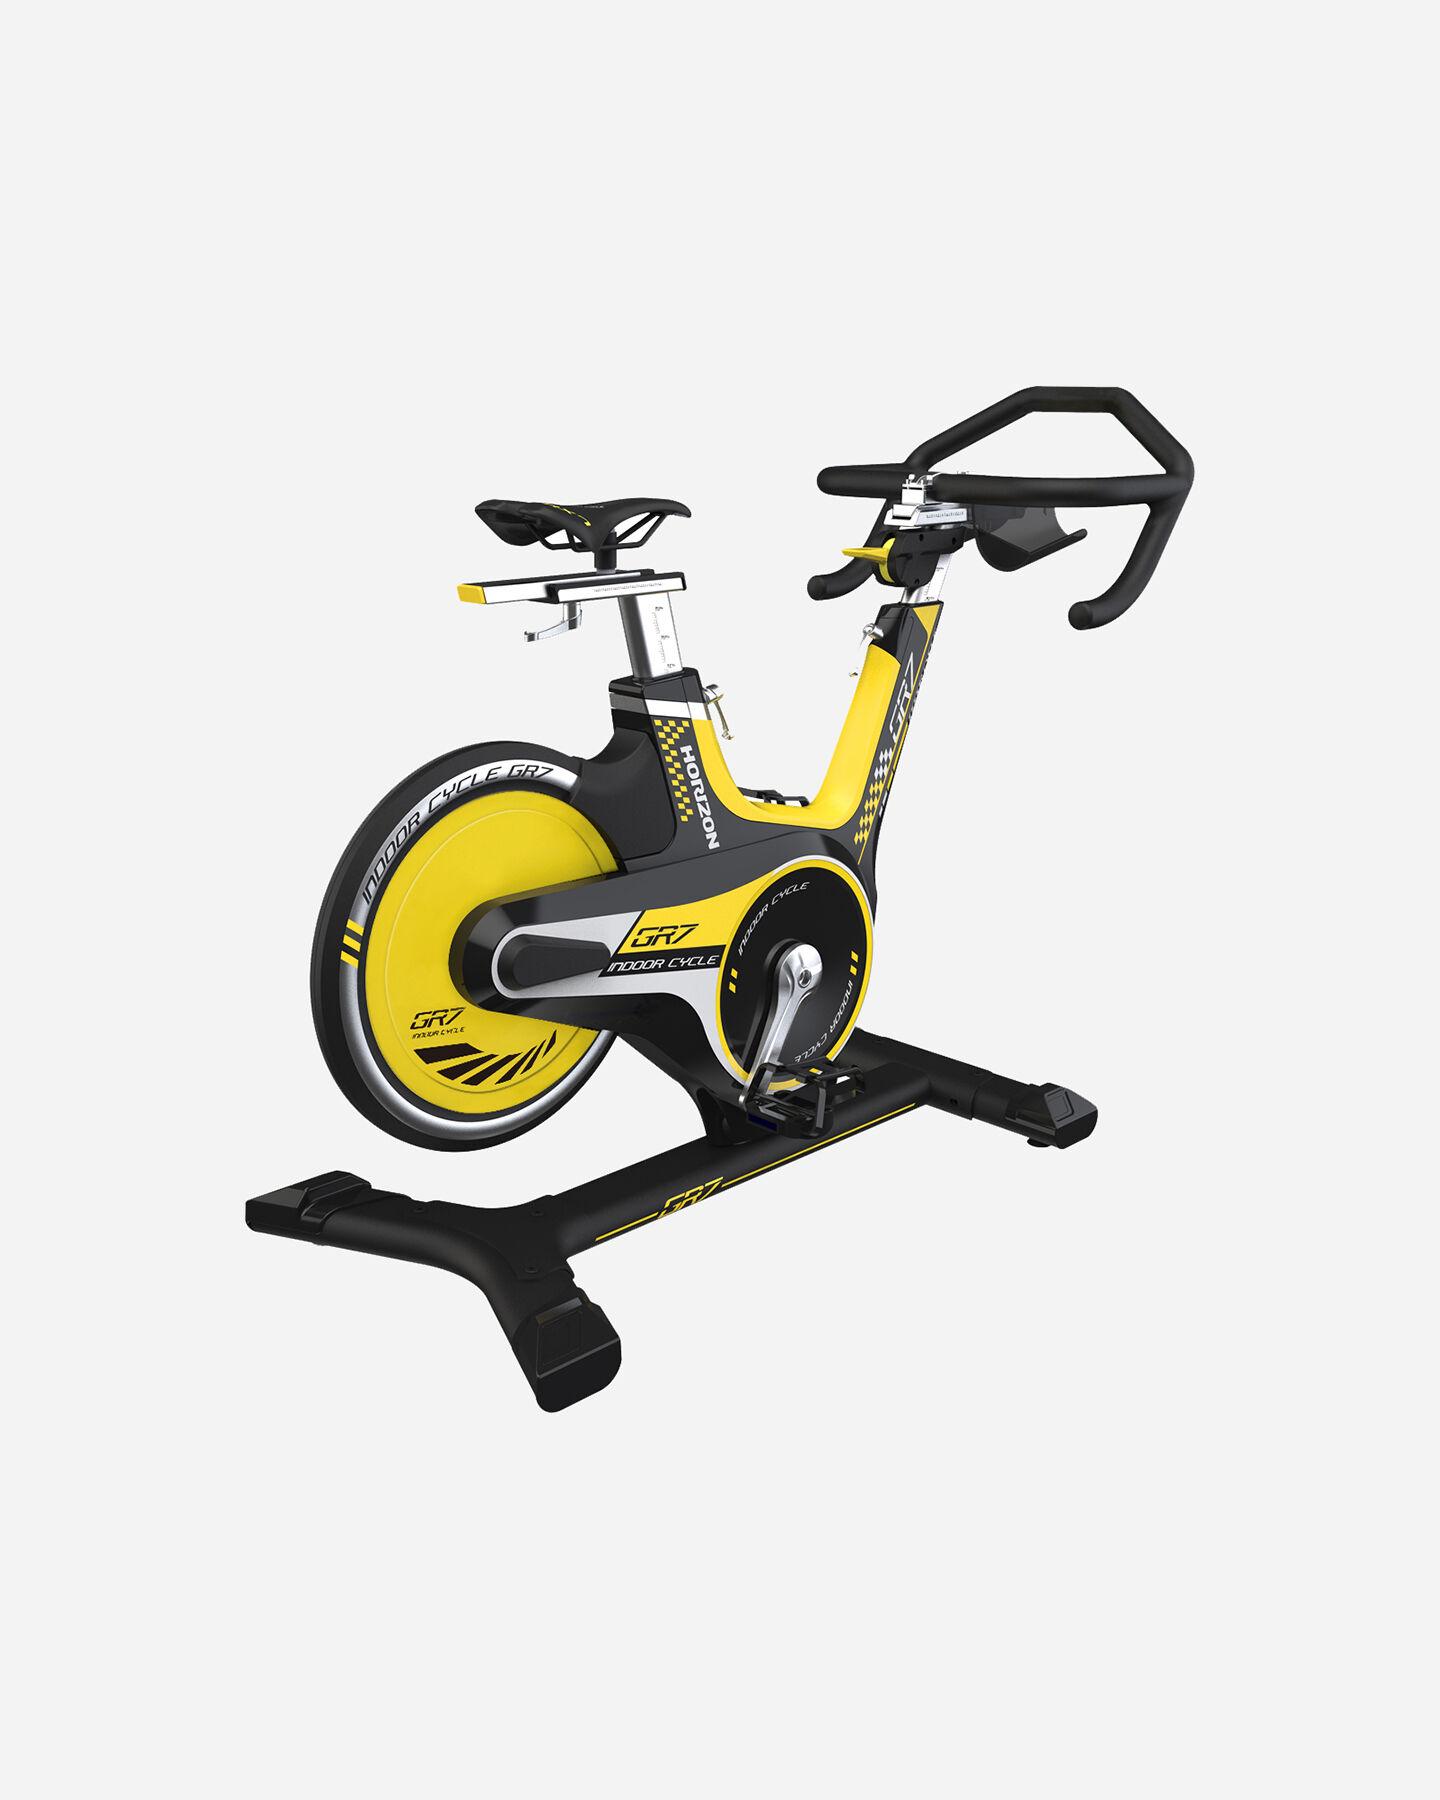 Spin bike HORIZON FITNESS HORIZON GRX7 S4076720 1 UNI scatto 1